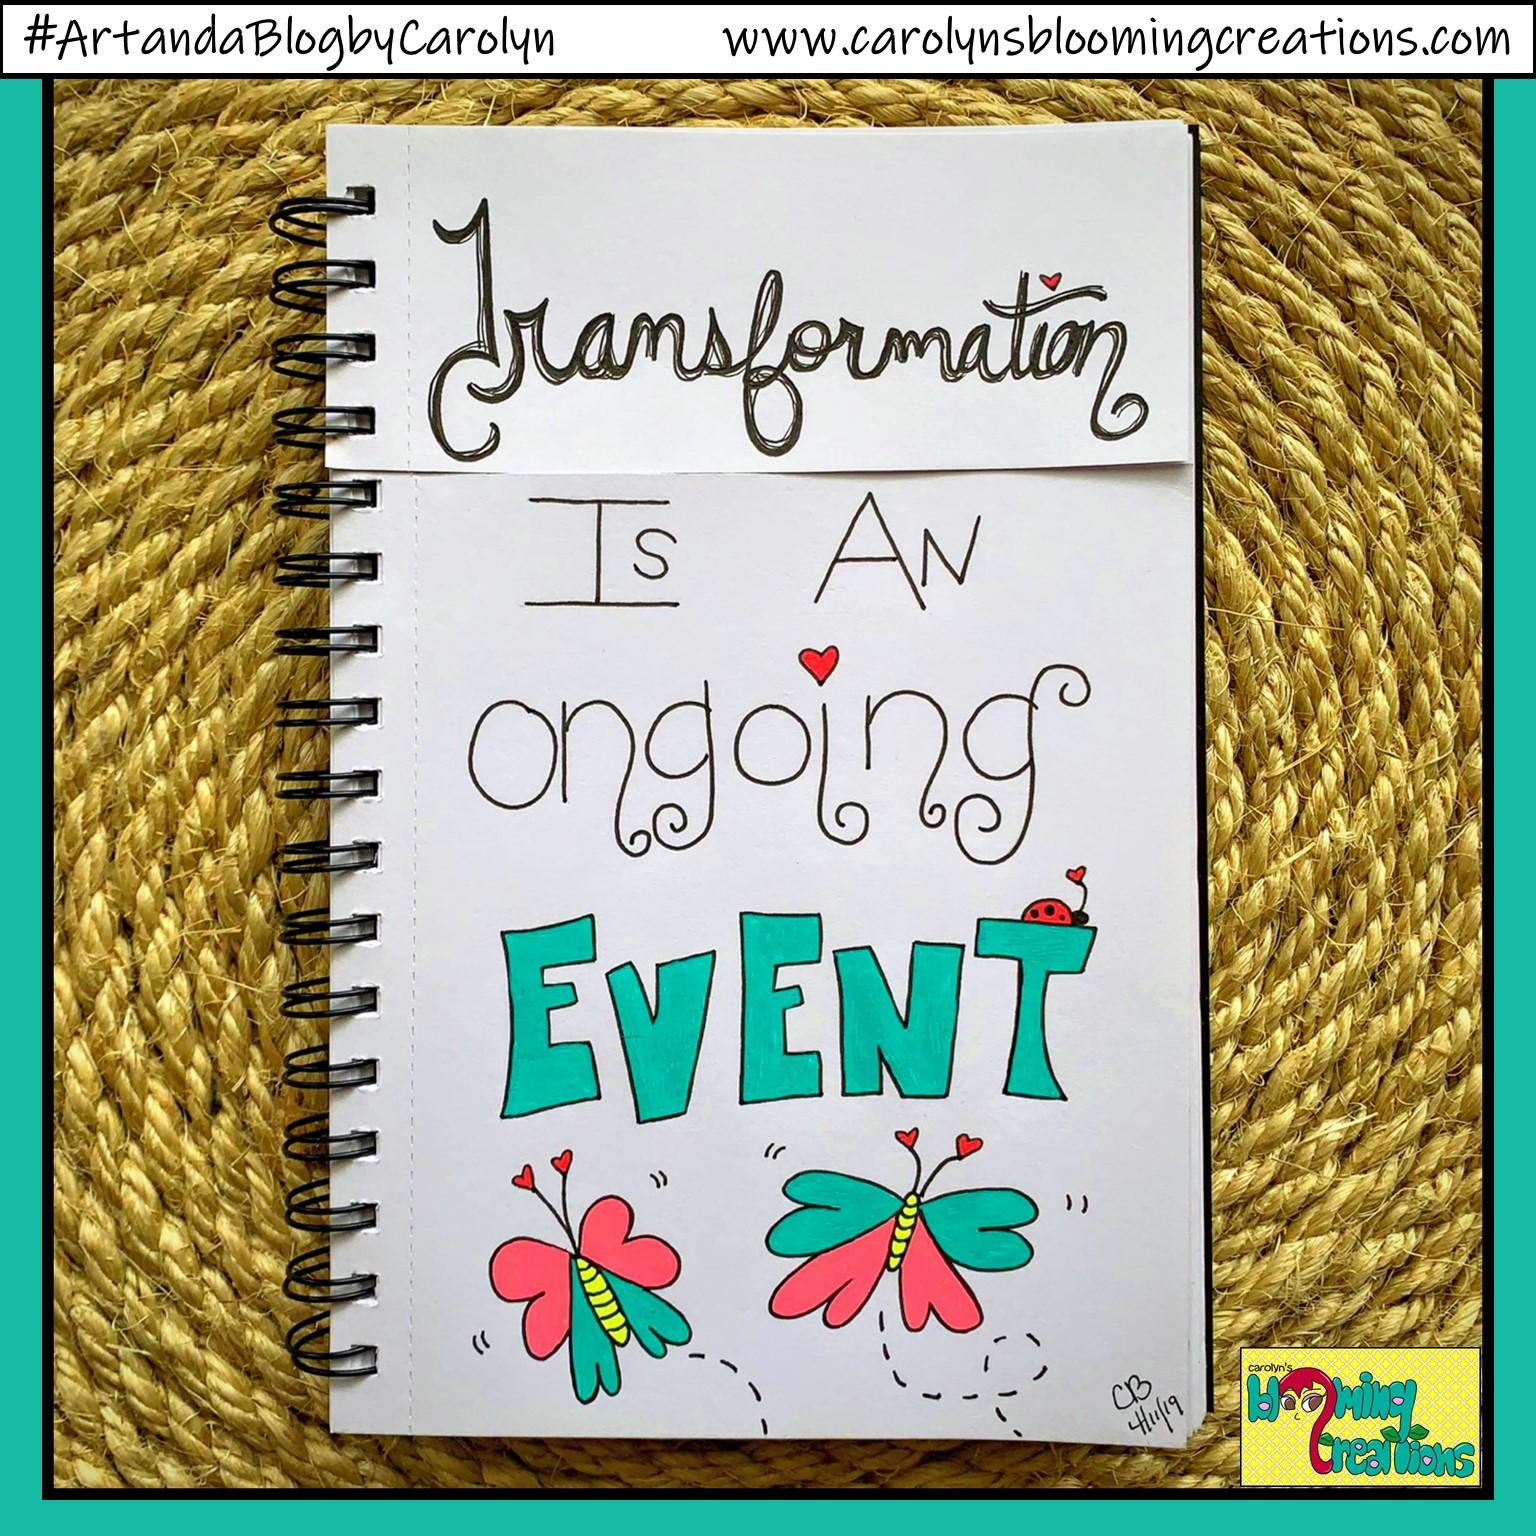 Pin me! www.carolynsbloomingcreations.com